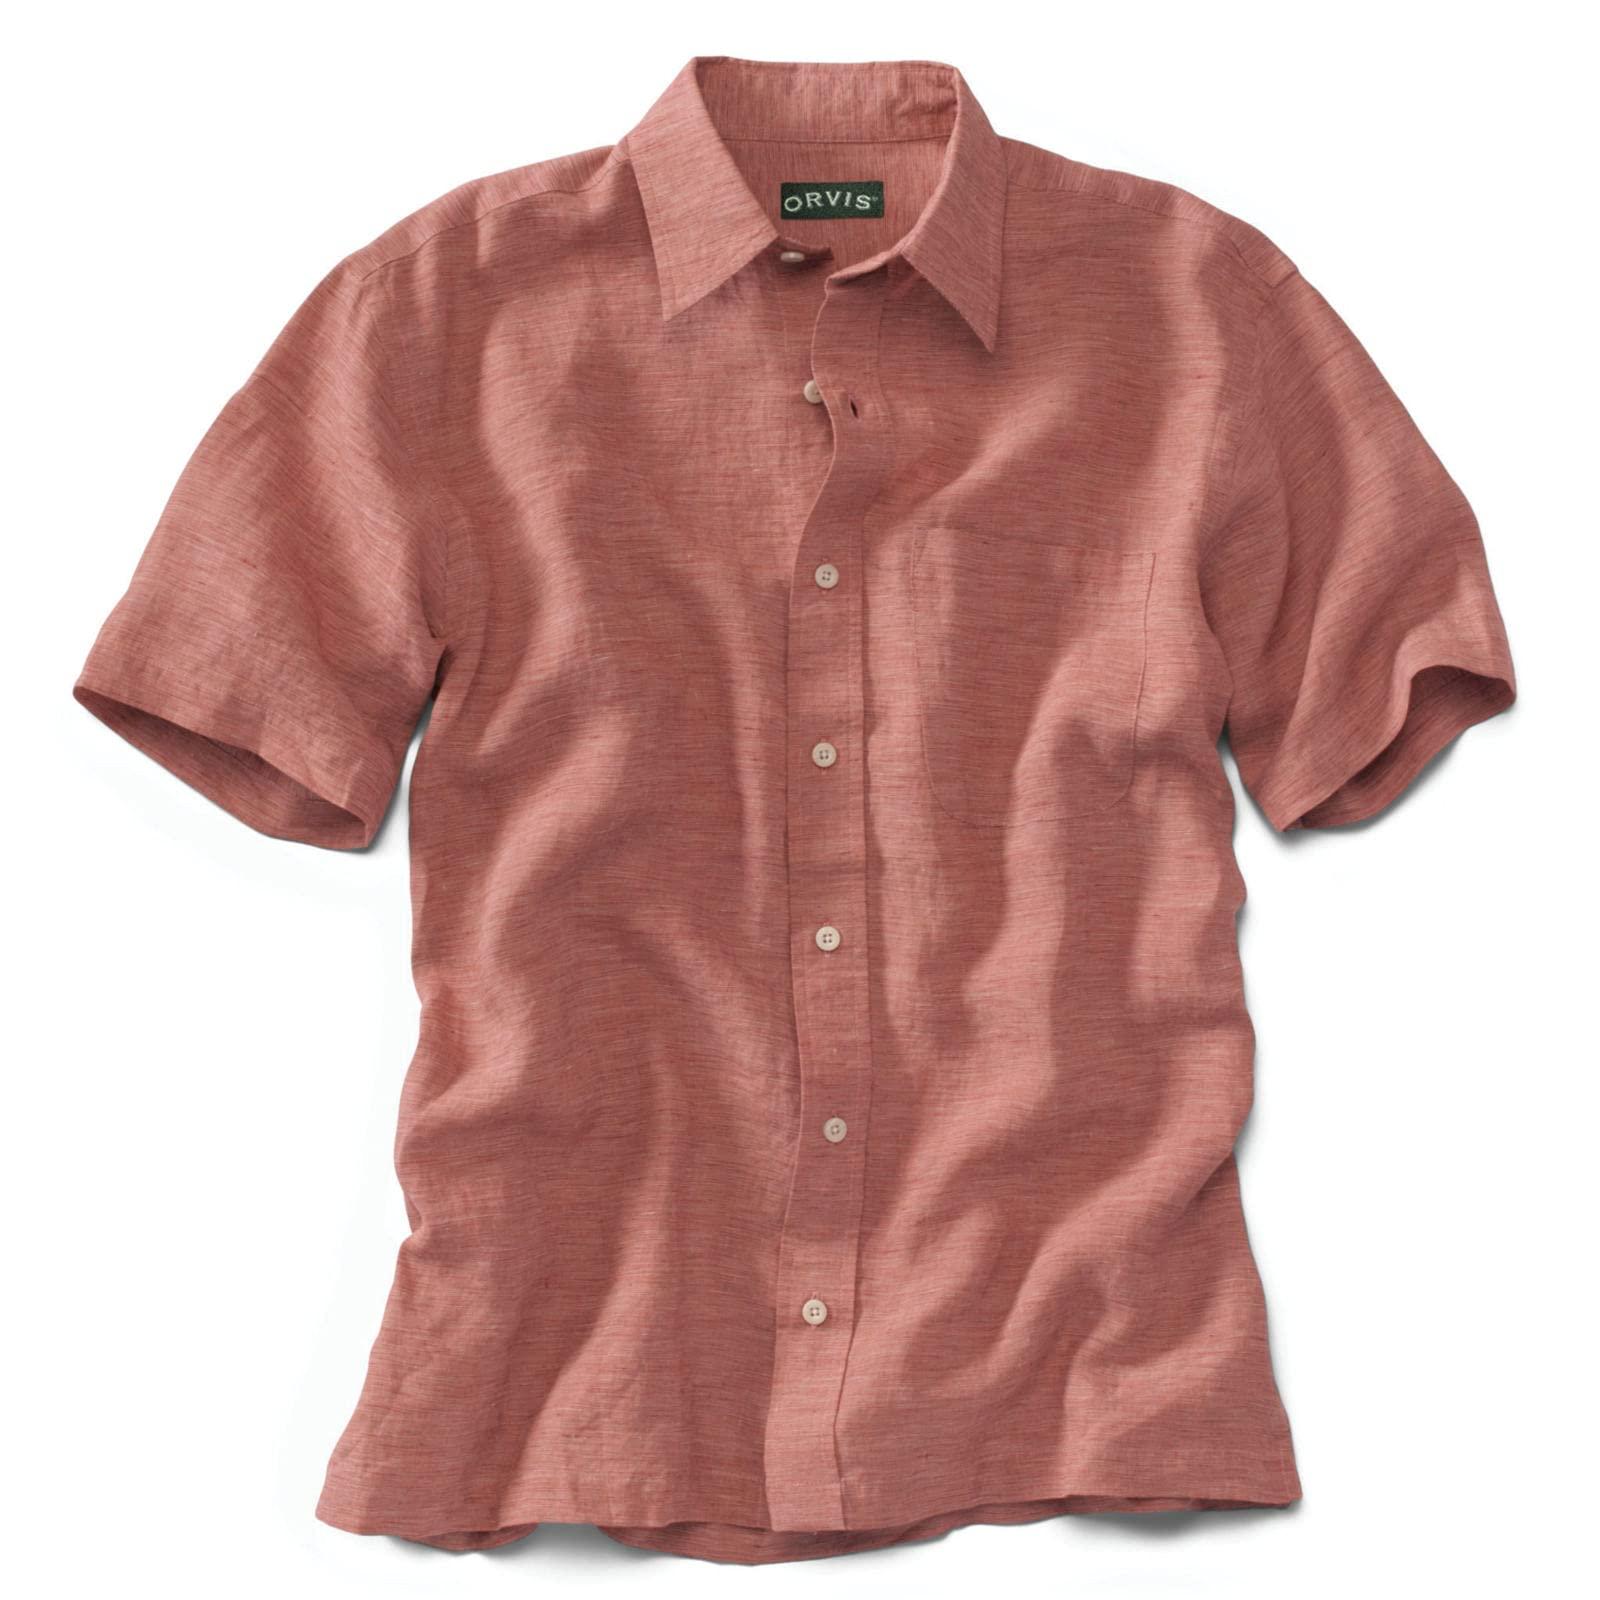 Orvis Pure Linen Havana Shirt